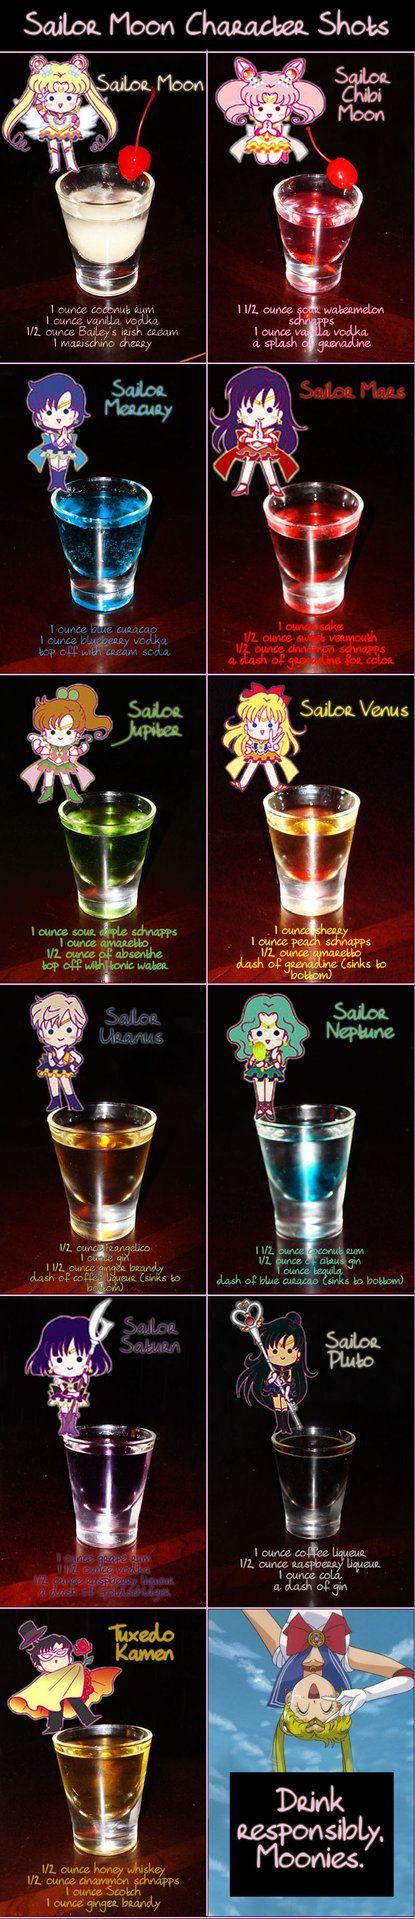 Sailor Moon Character Shots by Sillabub429